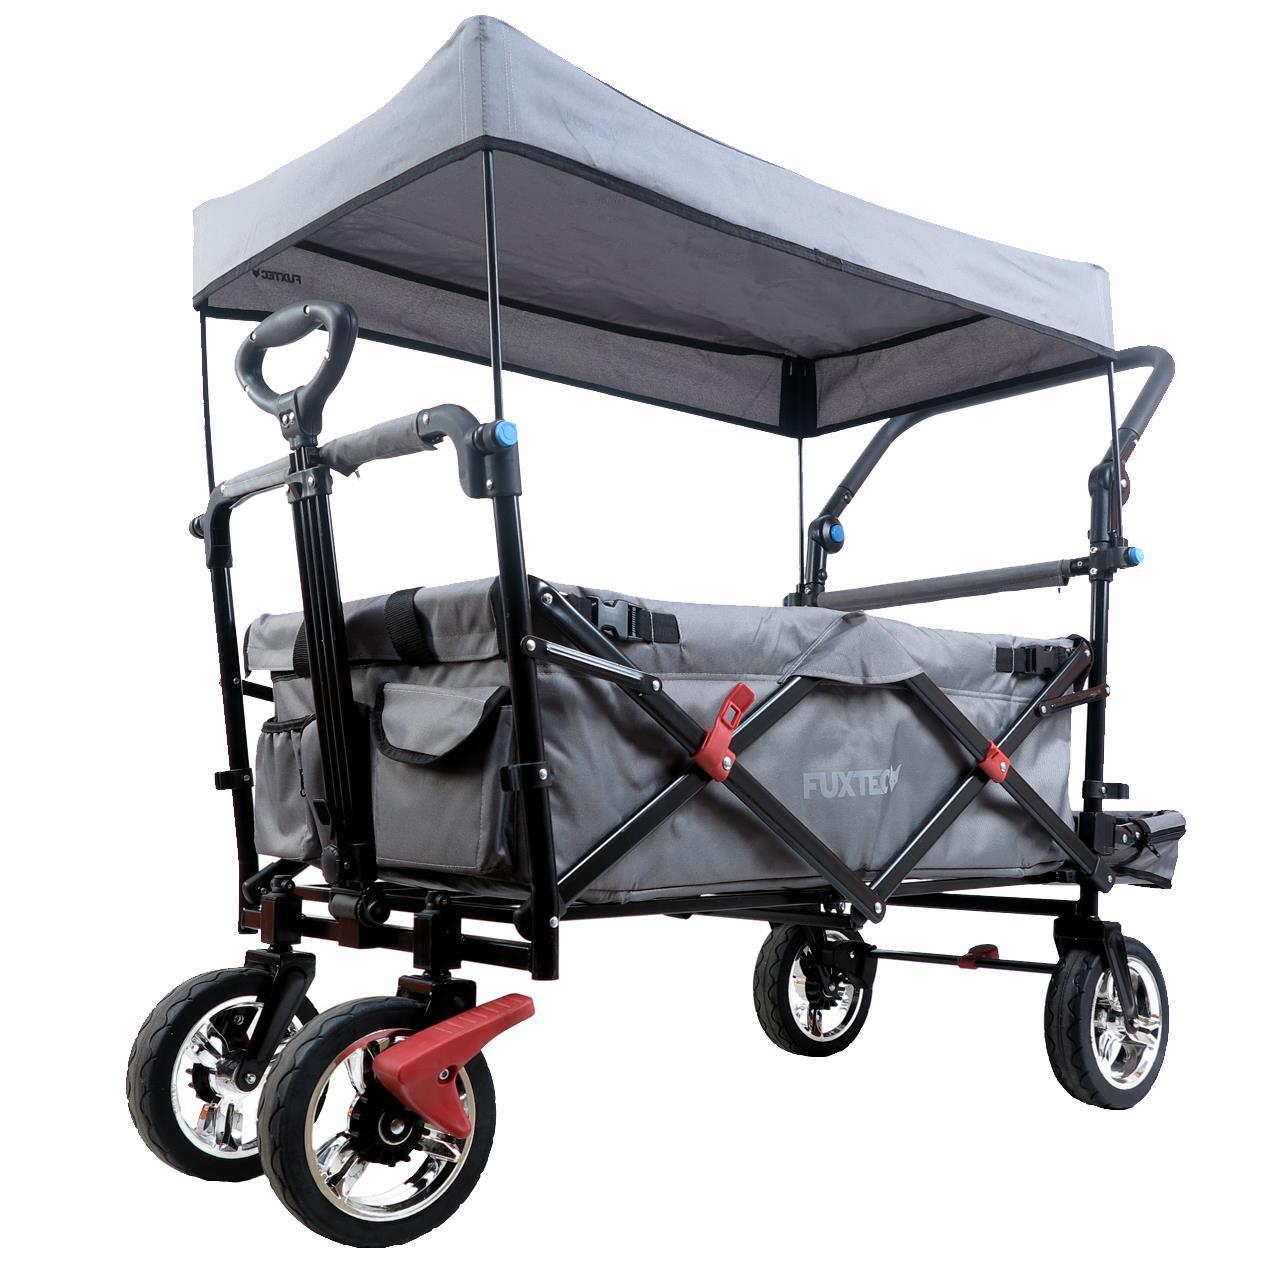 fuxtec bollerwagen fx ct800 faltbarer transportwagen handwagen gartenwagen ebay. Black Bedroom Furniture Sets. Home Design Ideas